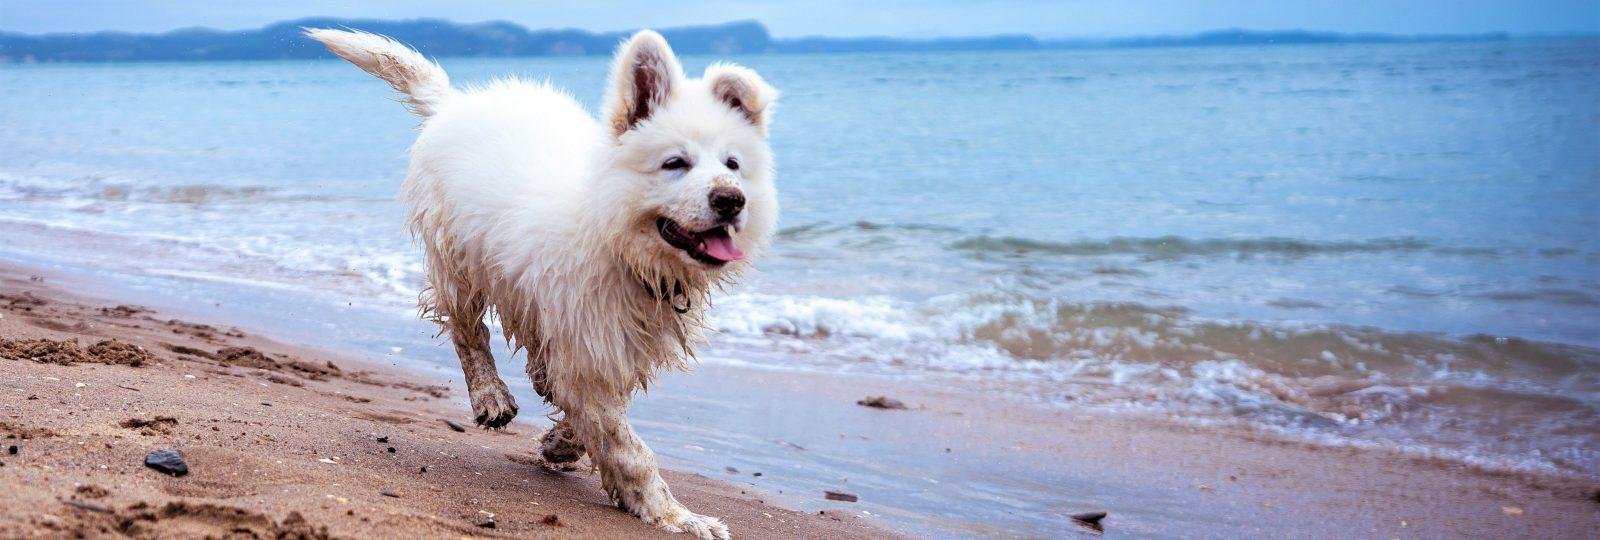 Banner Dog - Calm & Comfort